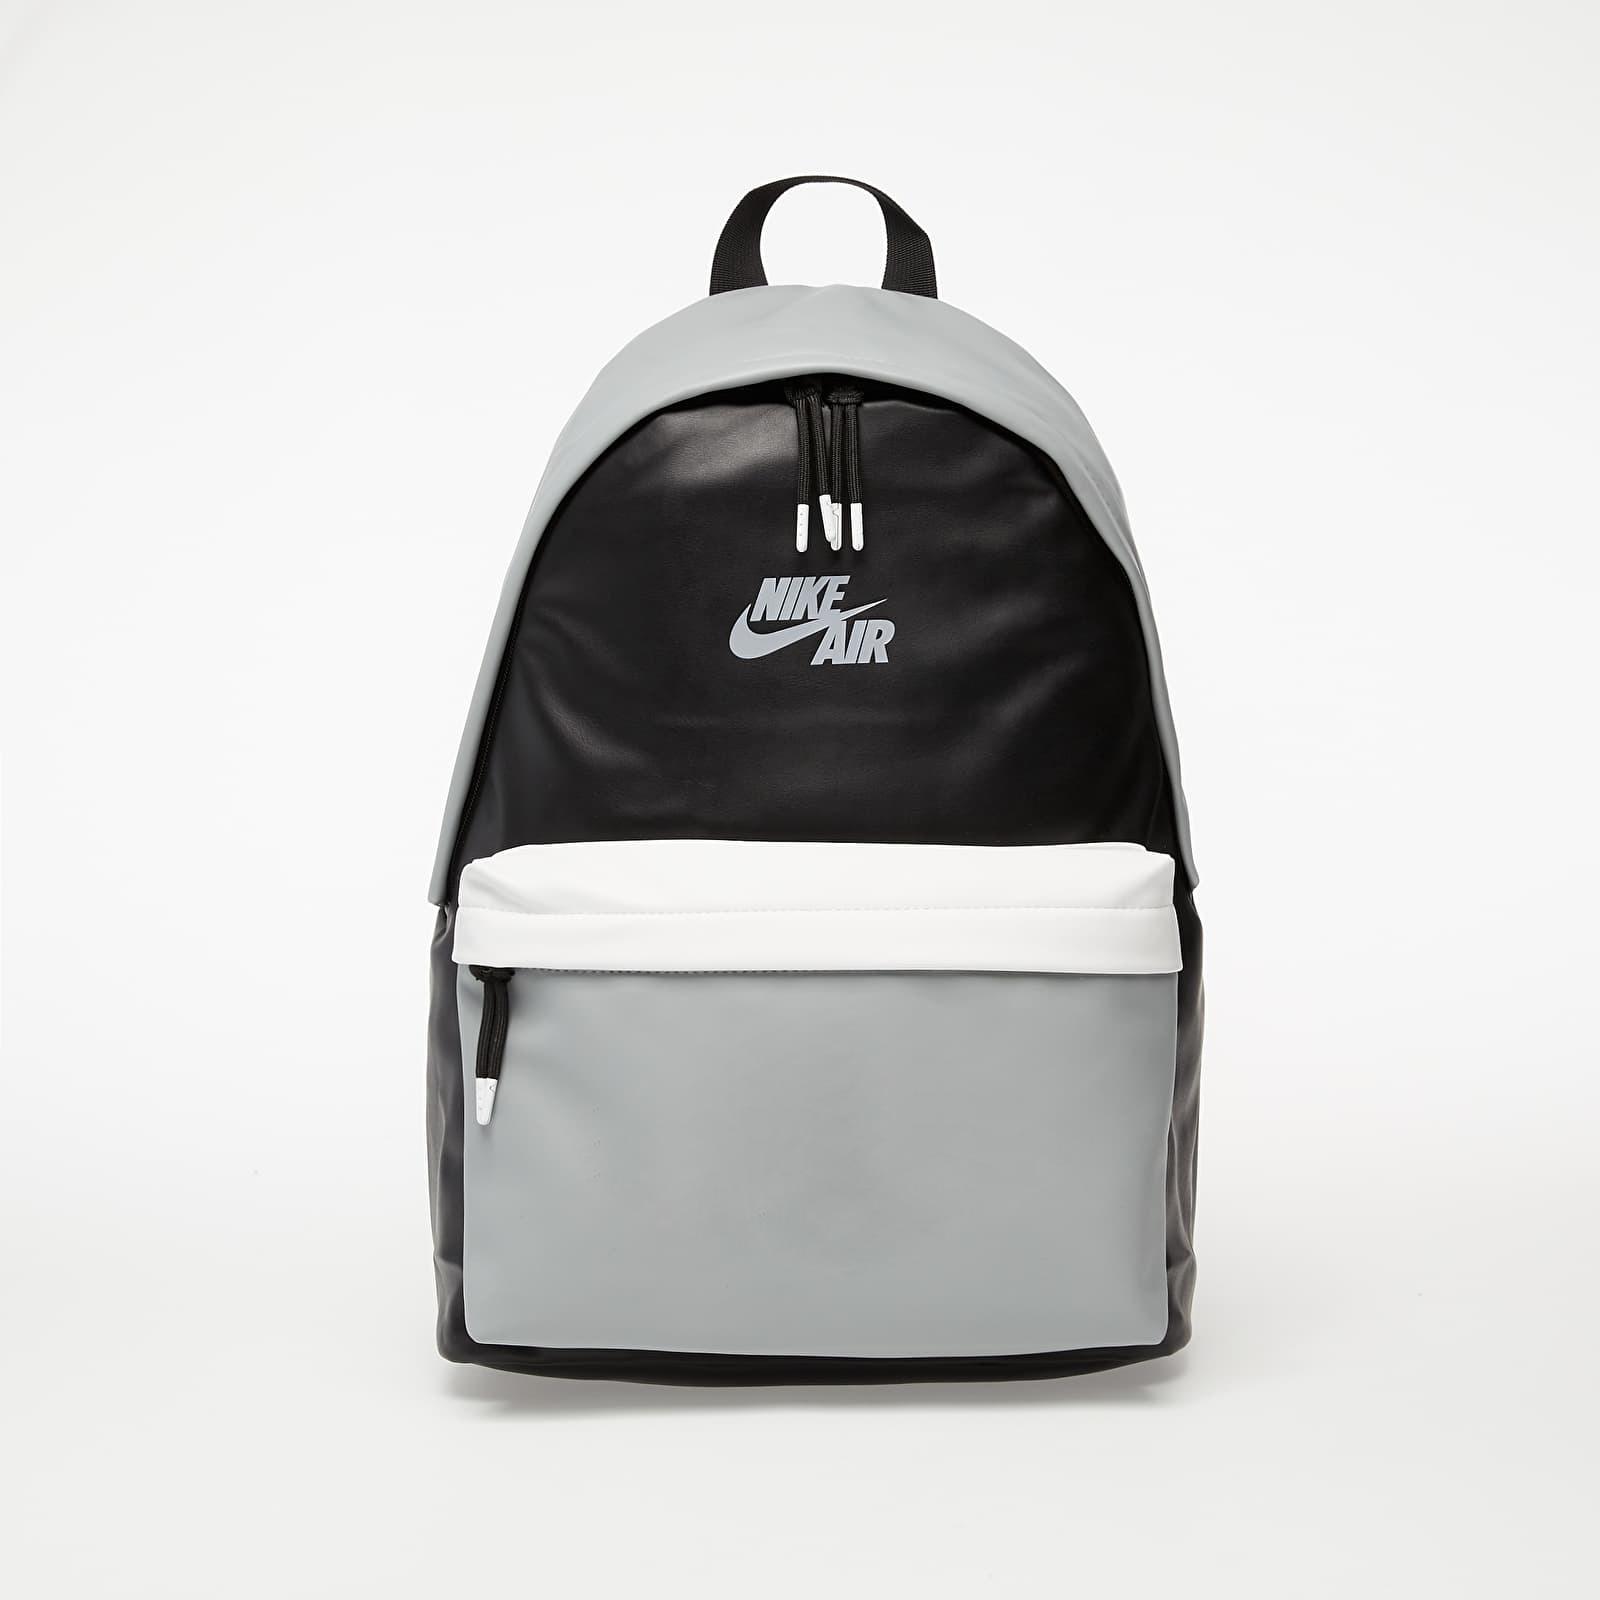 Jordan Air 1 Backpack Grey 35 liters